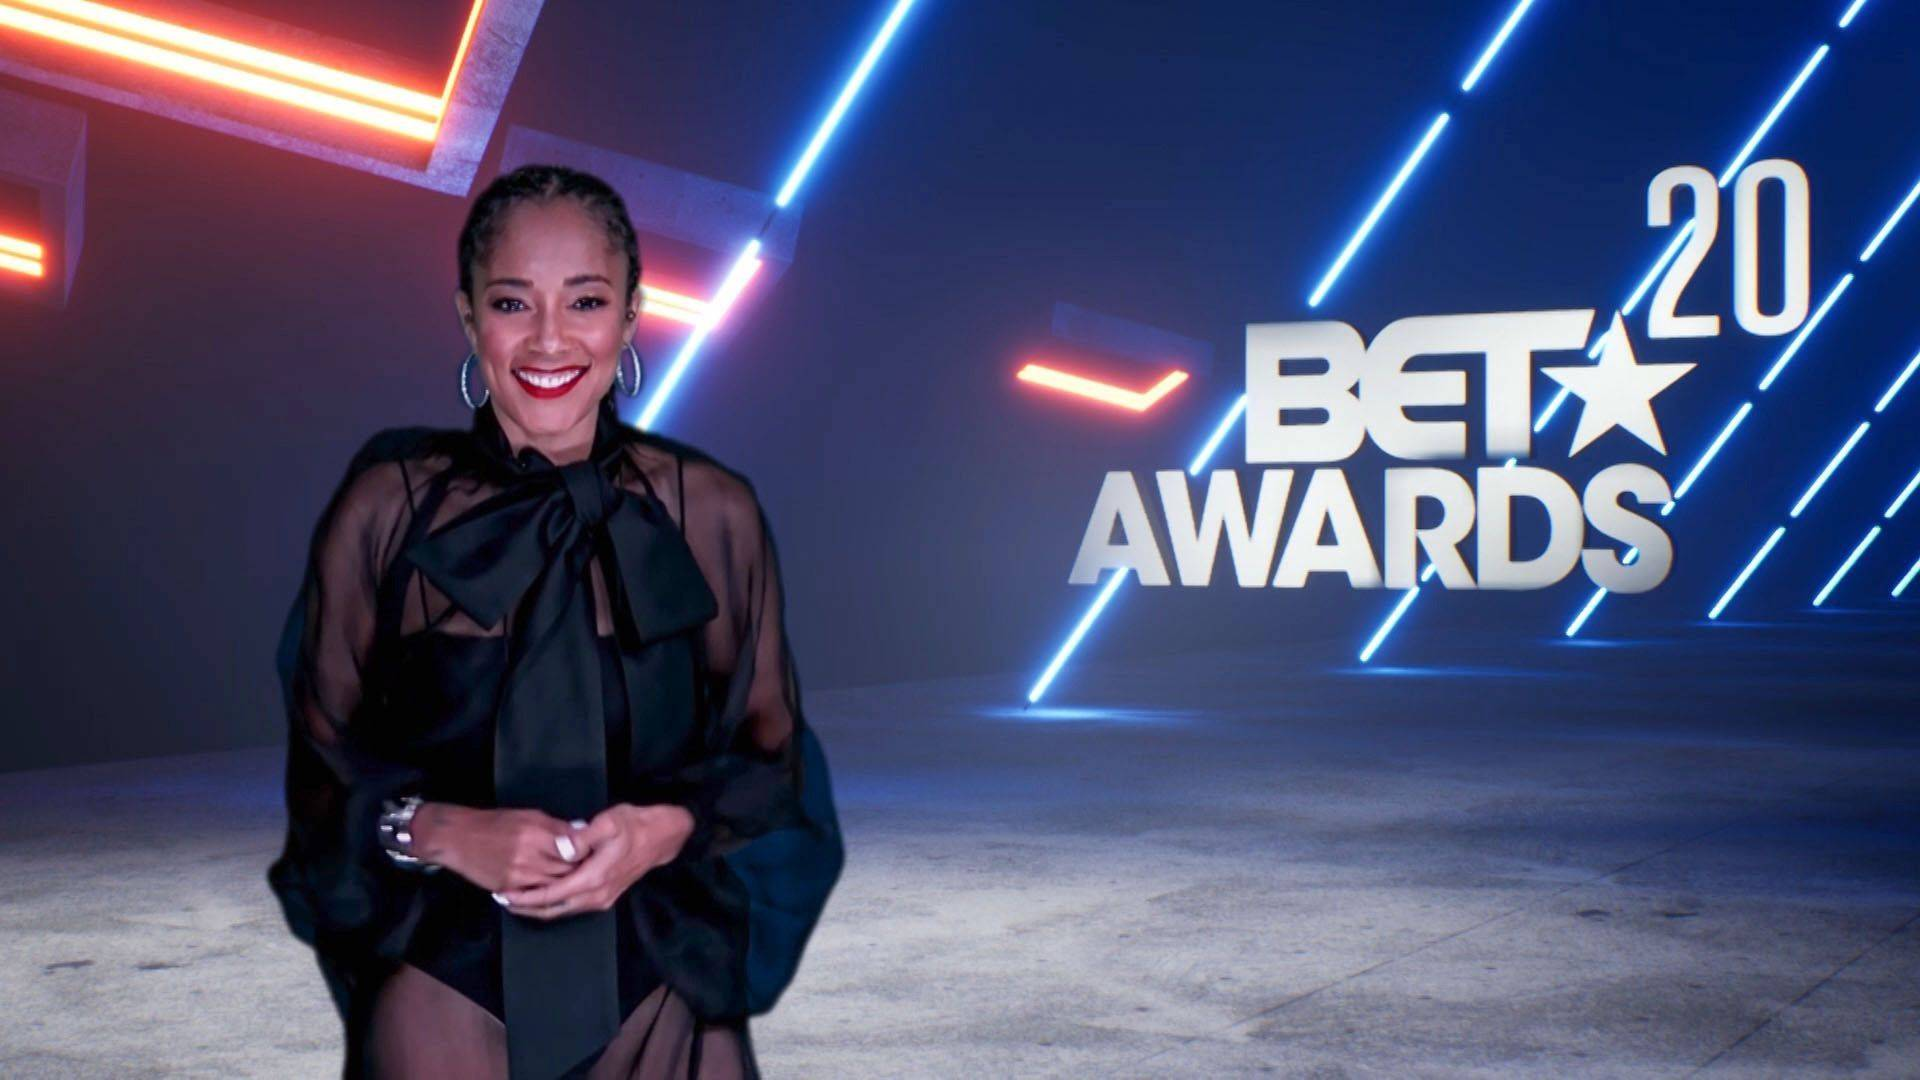 BET Awards 2020 | Host Looks Gallery 8 | 1920x1080